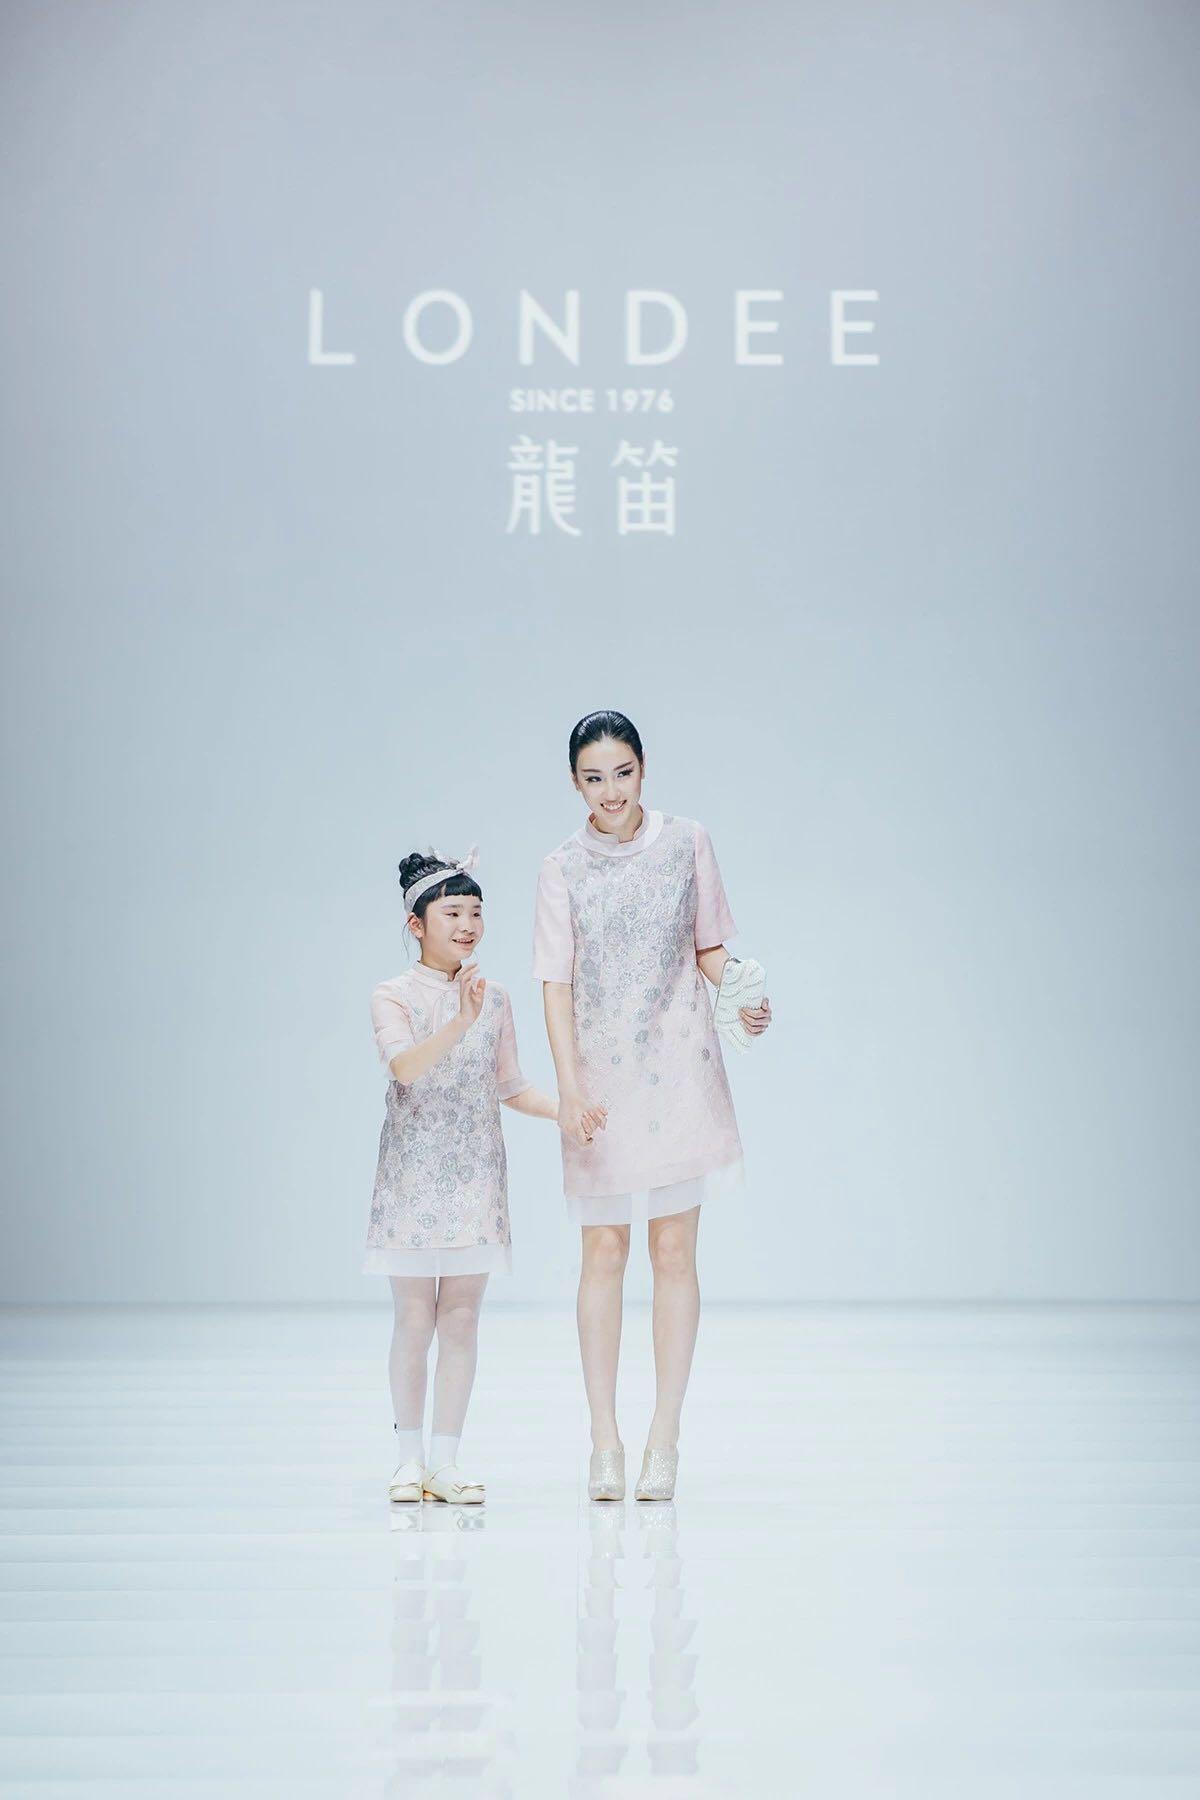 LONDEE龙笛大秀,看见最精致摩登的高级中国风